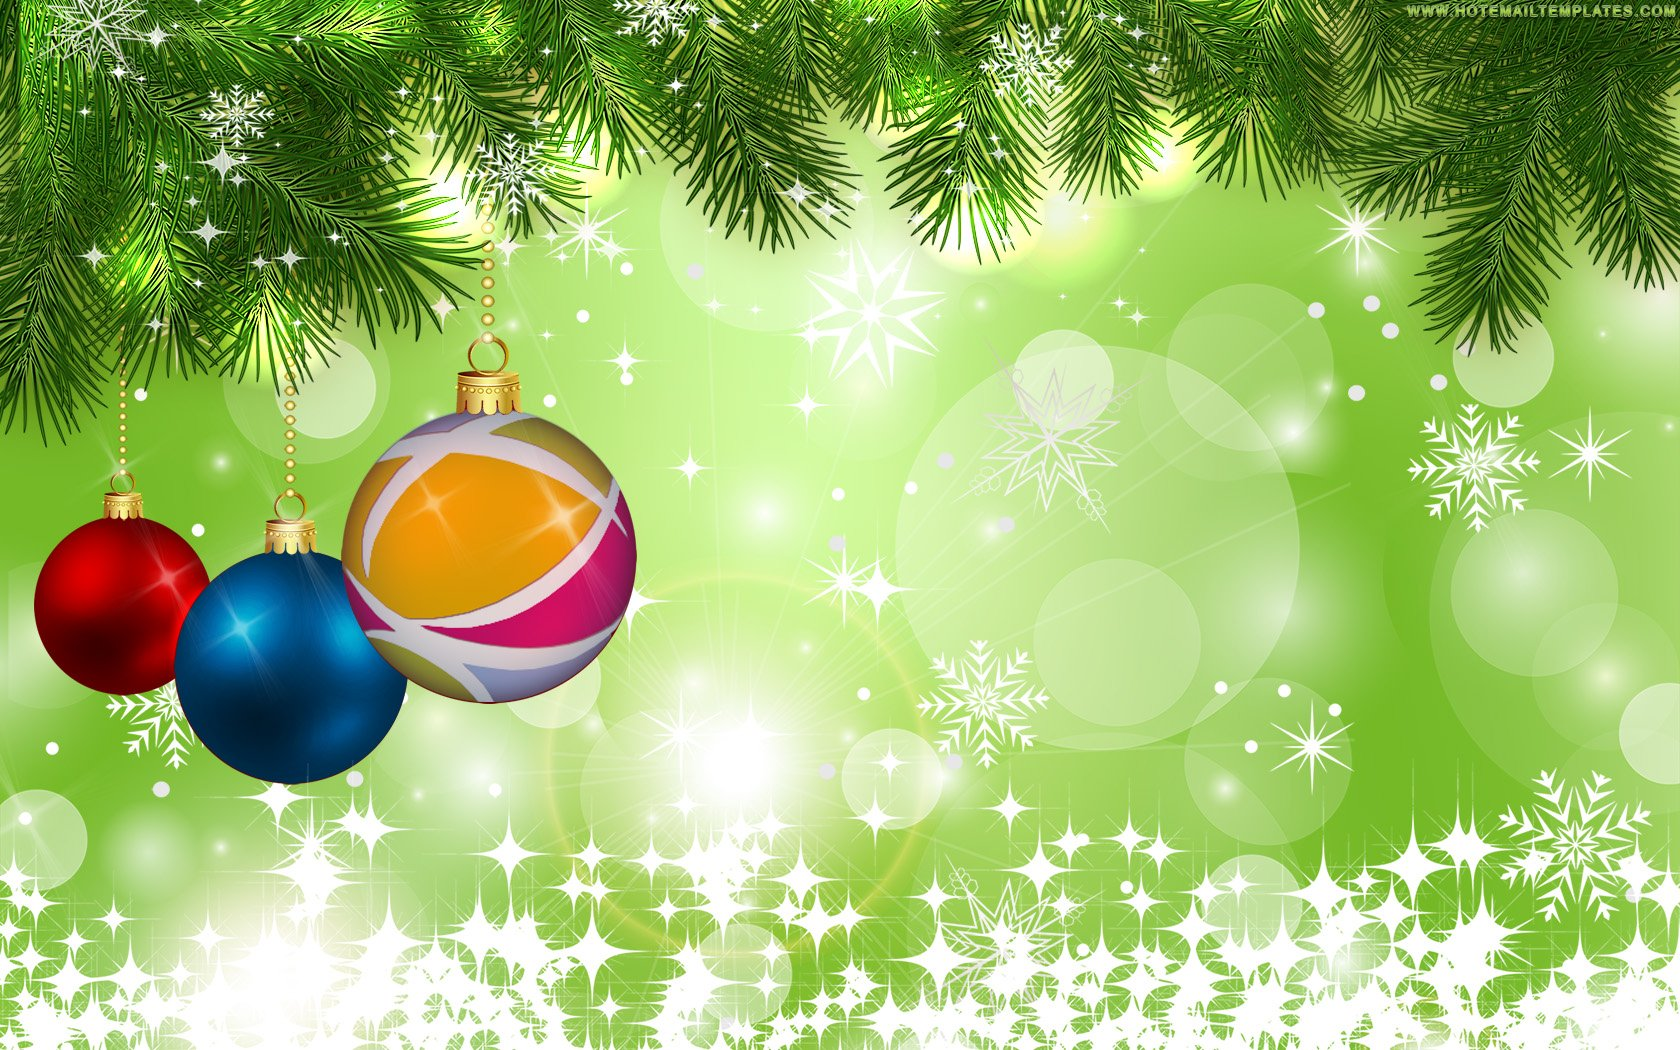 Winter Holiday 2014 | Free HTML E-Mail Templates